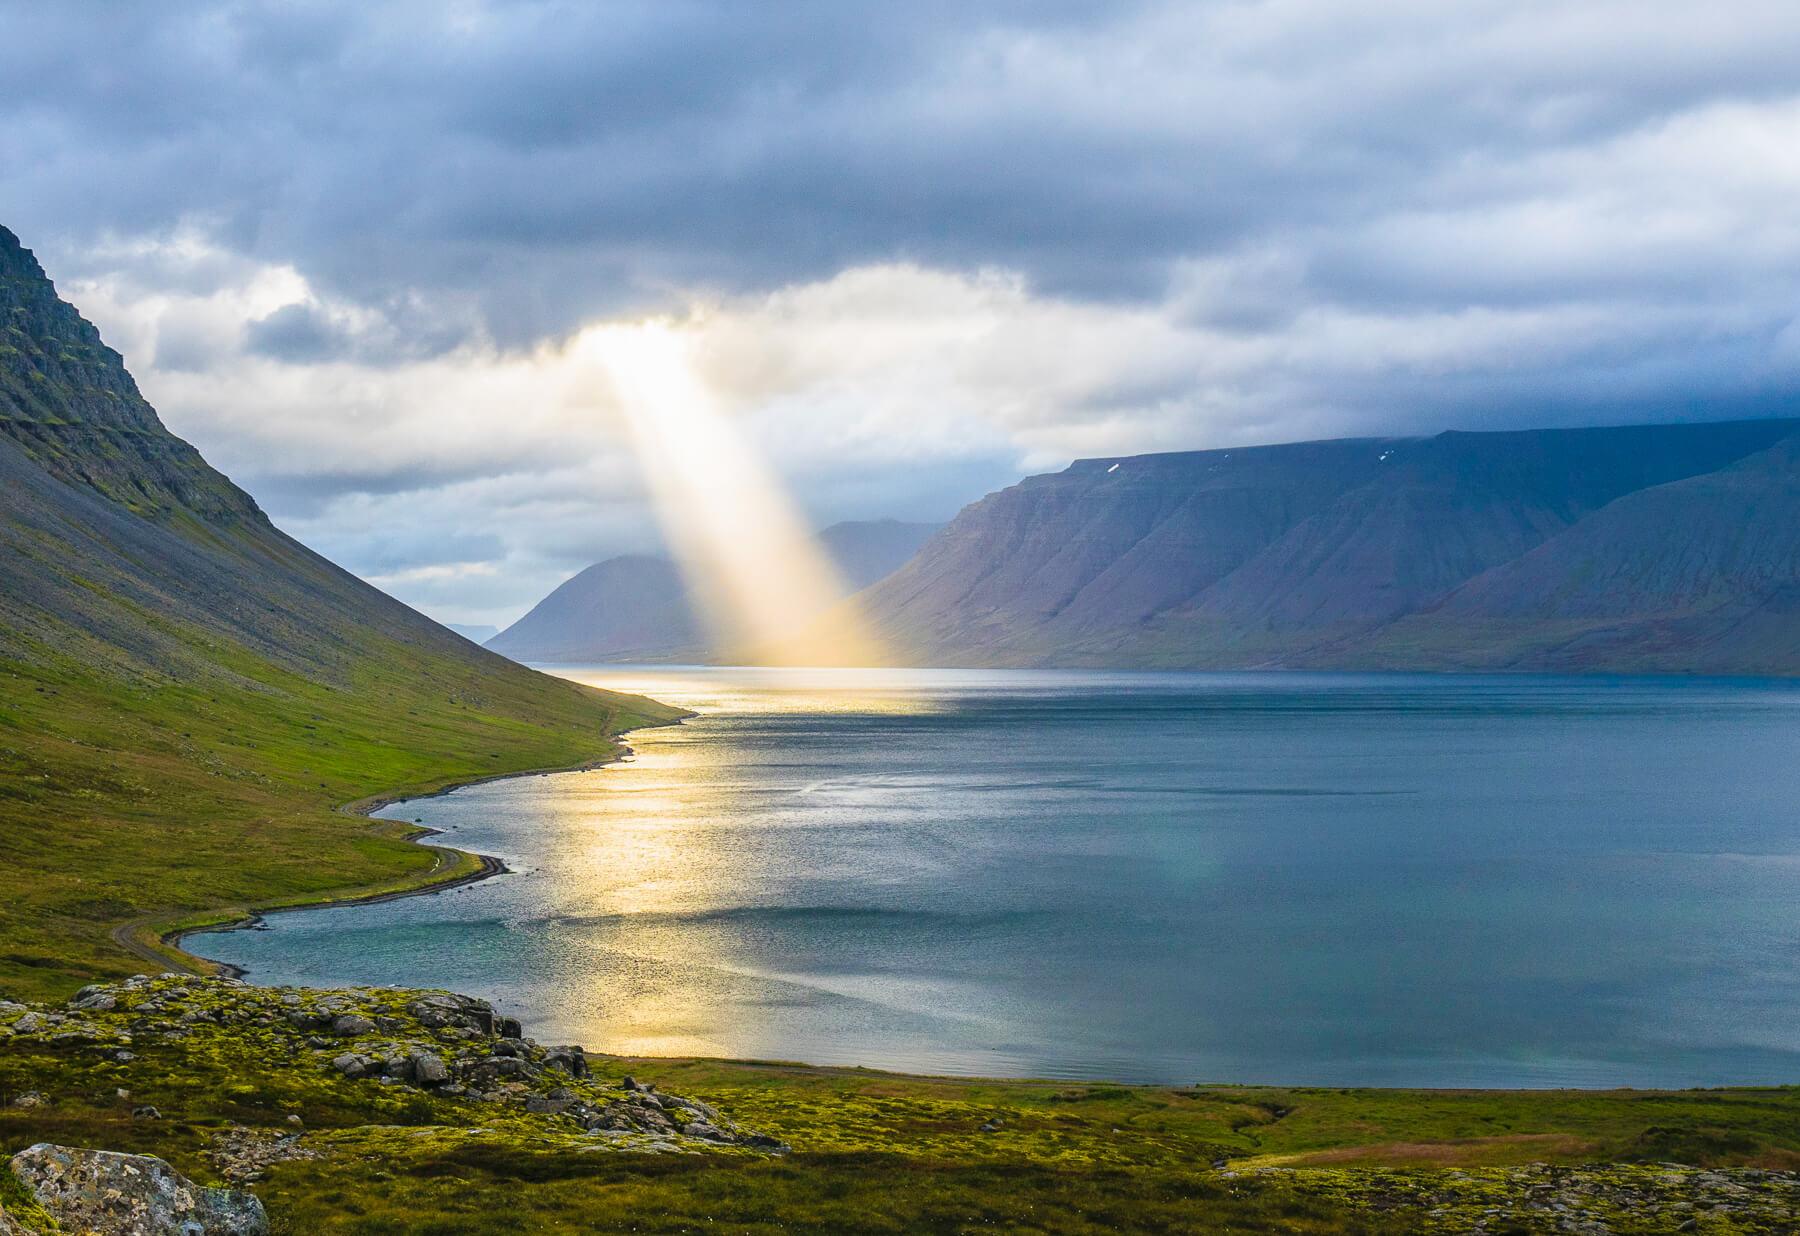 sun shining through clouds onto lake